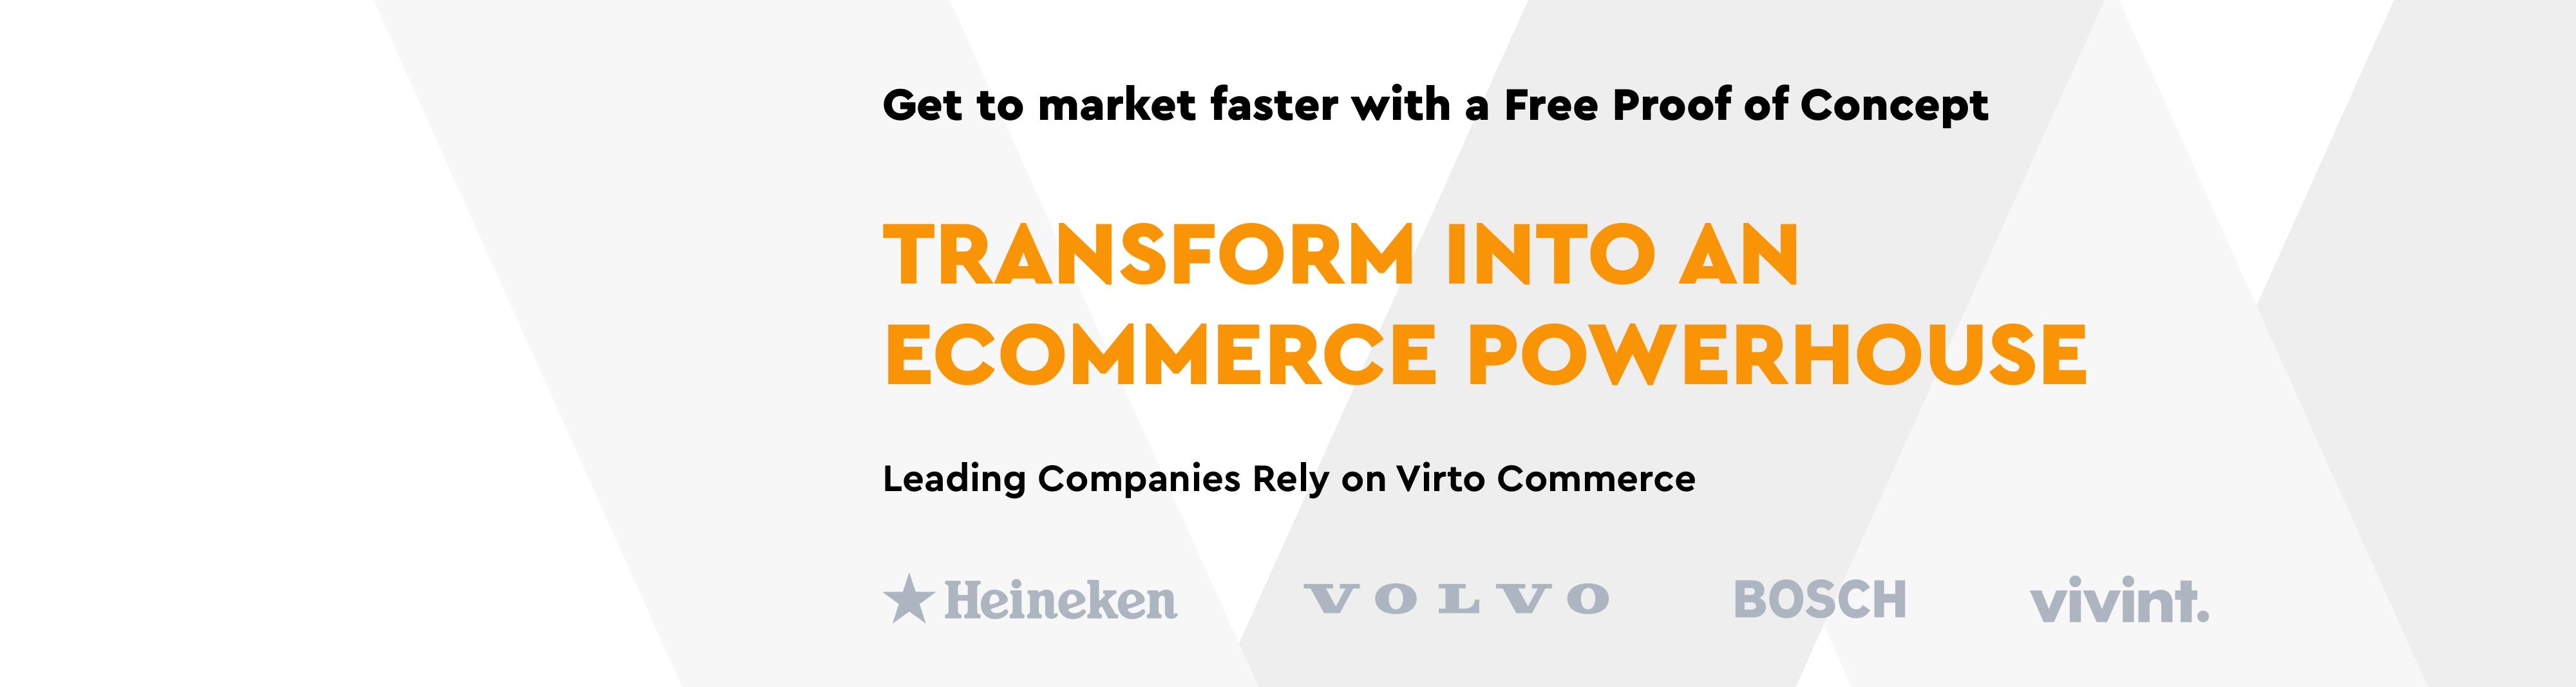 Virto Commerce